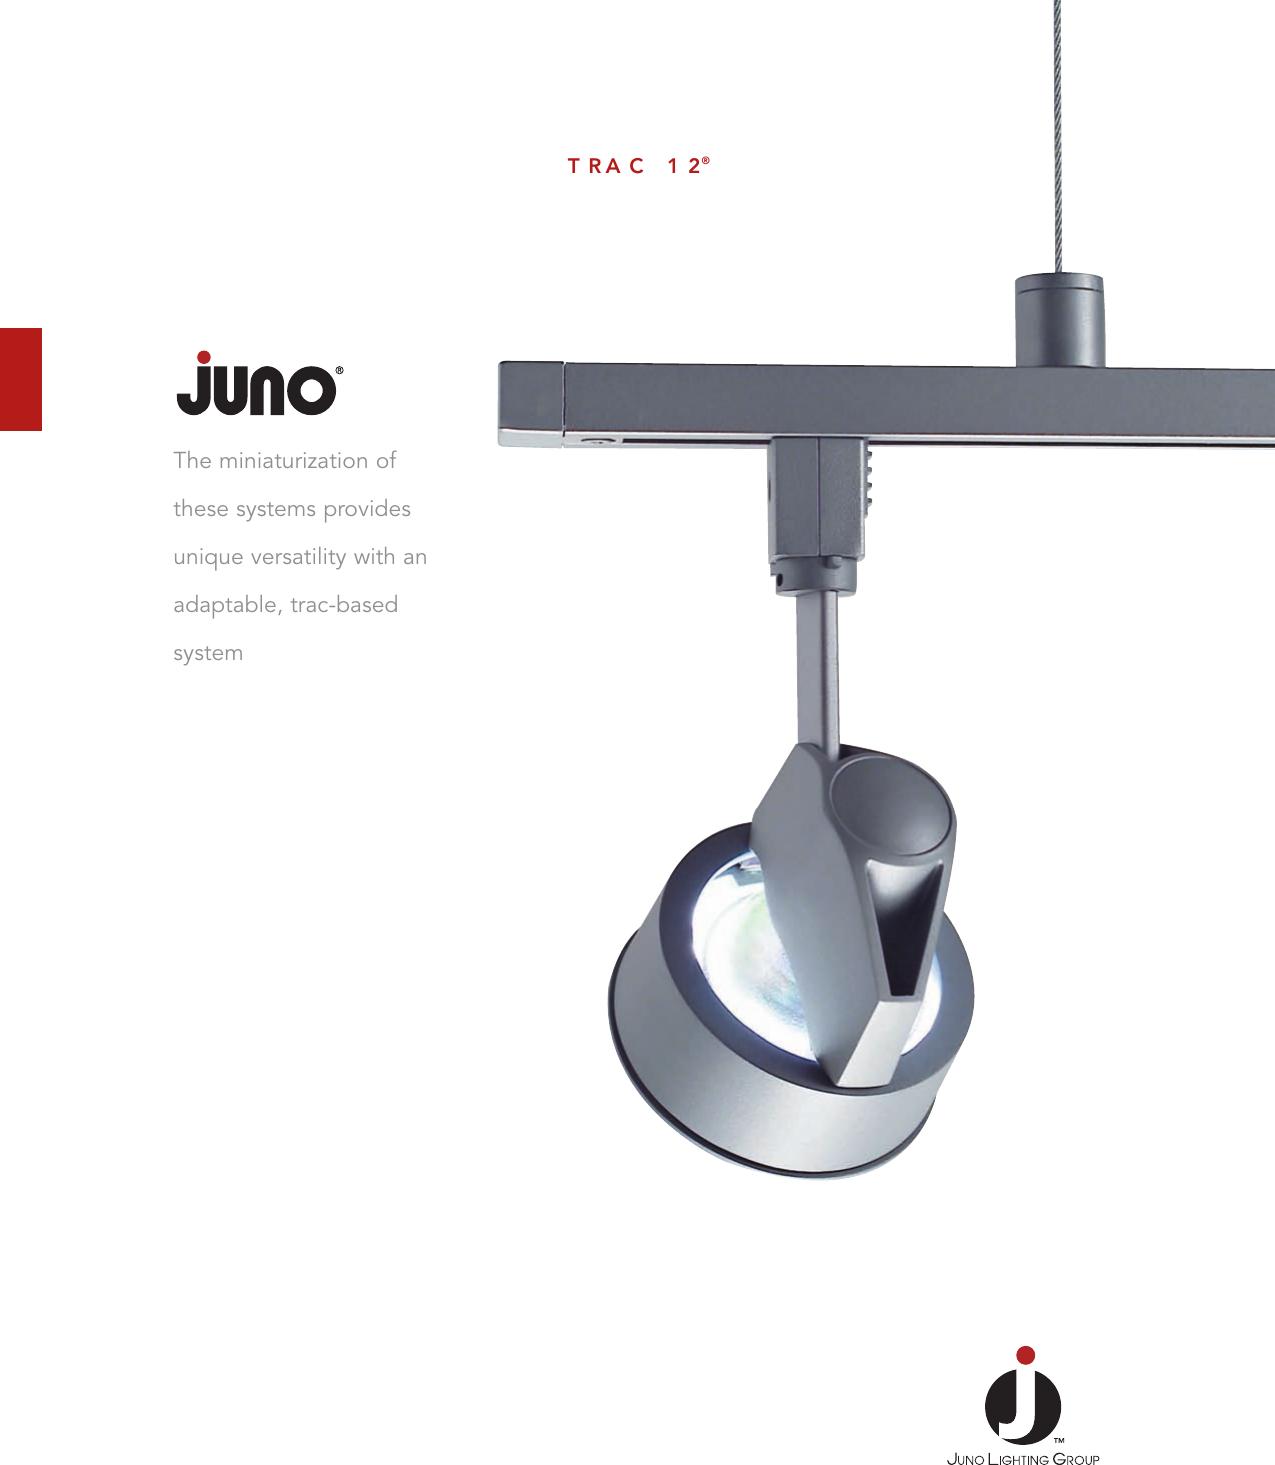 Juno Lighting Group TL20 WH ADJUSTABLE JOINER